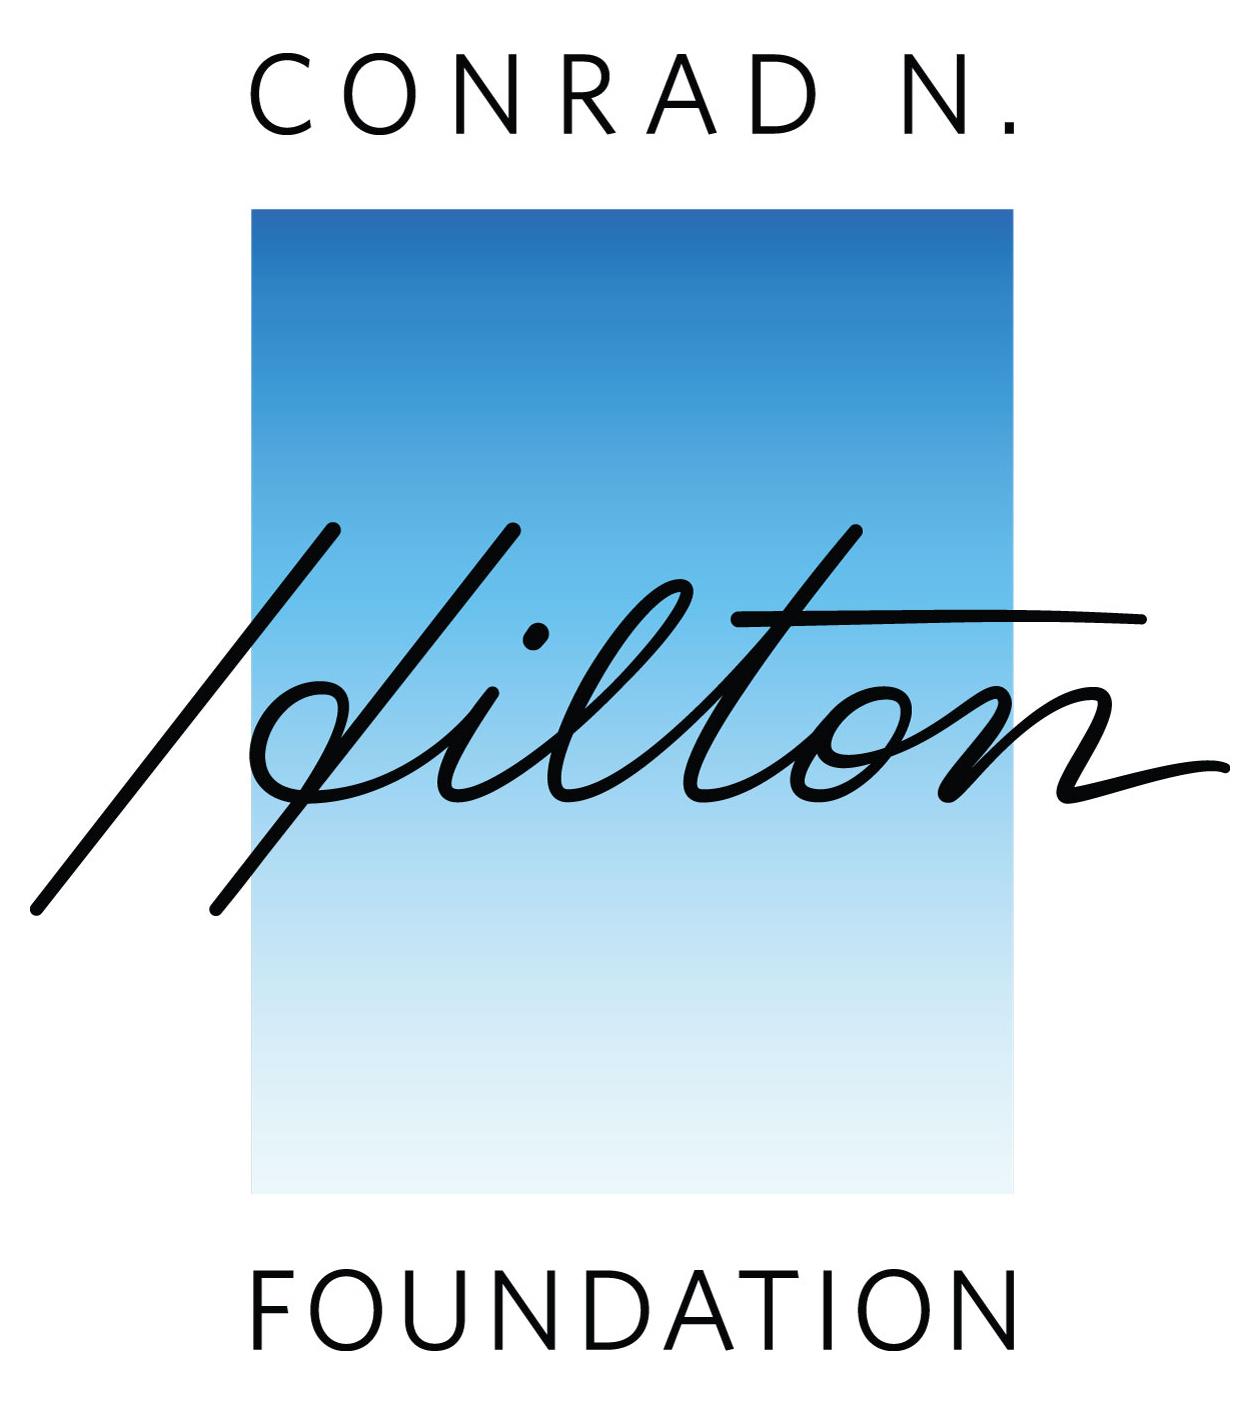 Conrad N  Hilton Foundation Announces Marc Holley as Vice